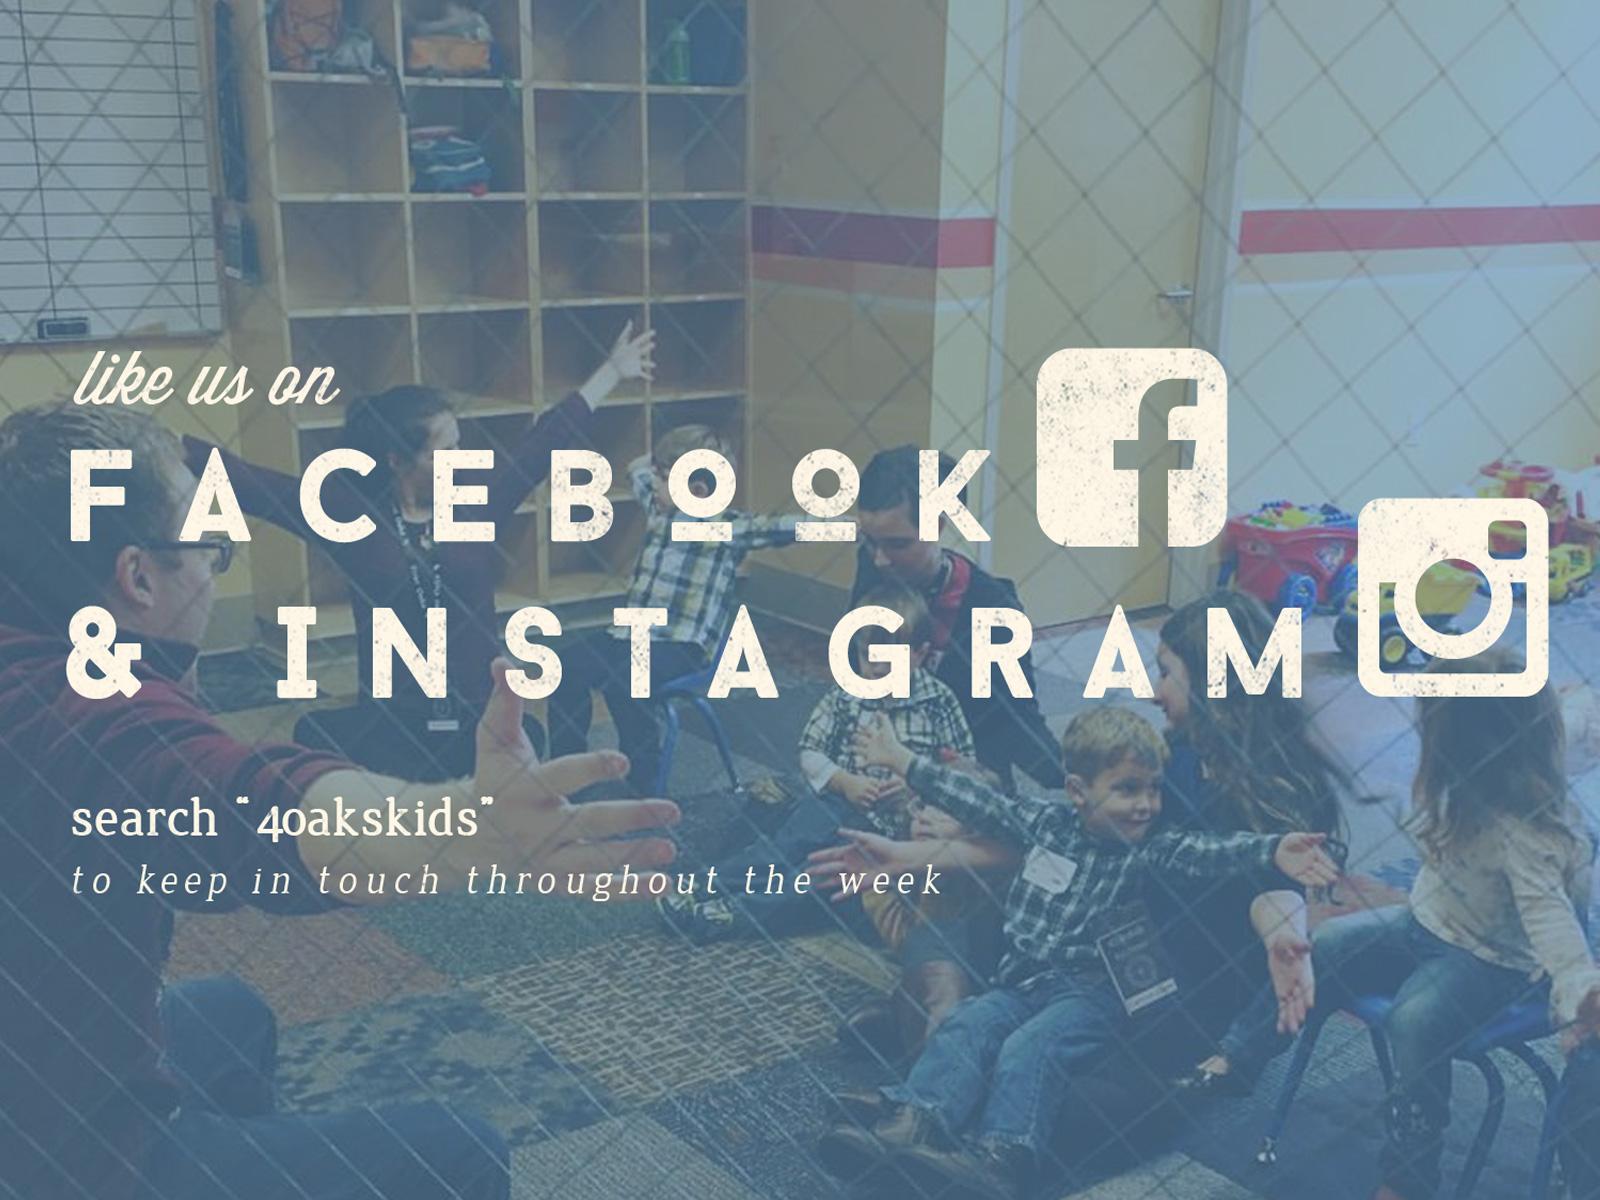 We're on Facebook & Instagram